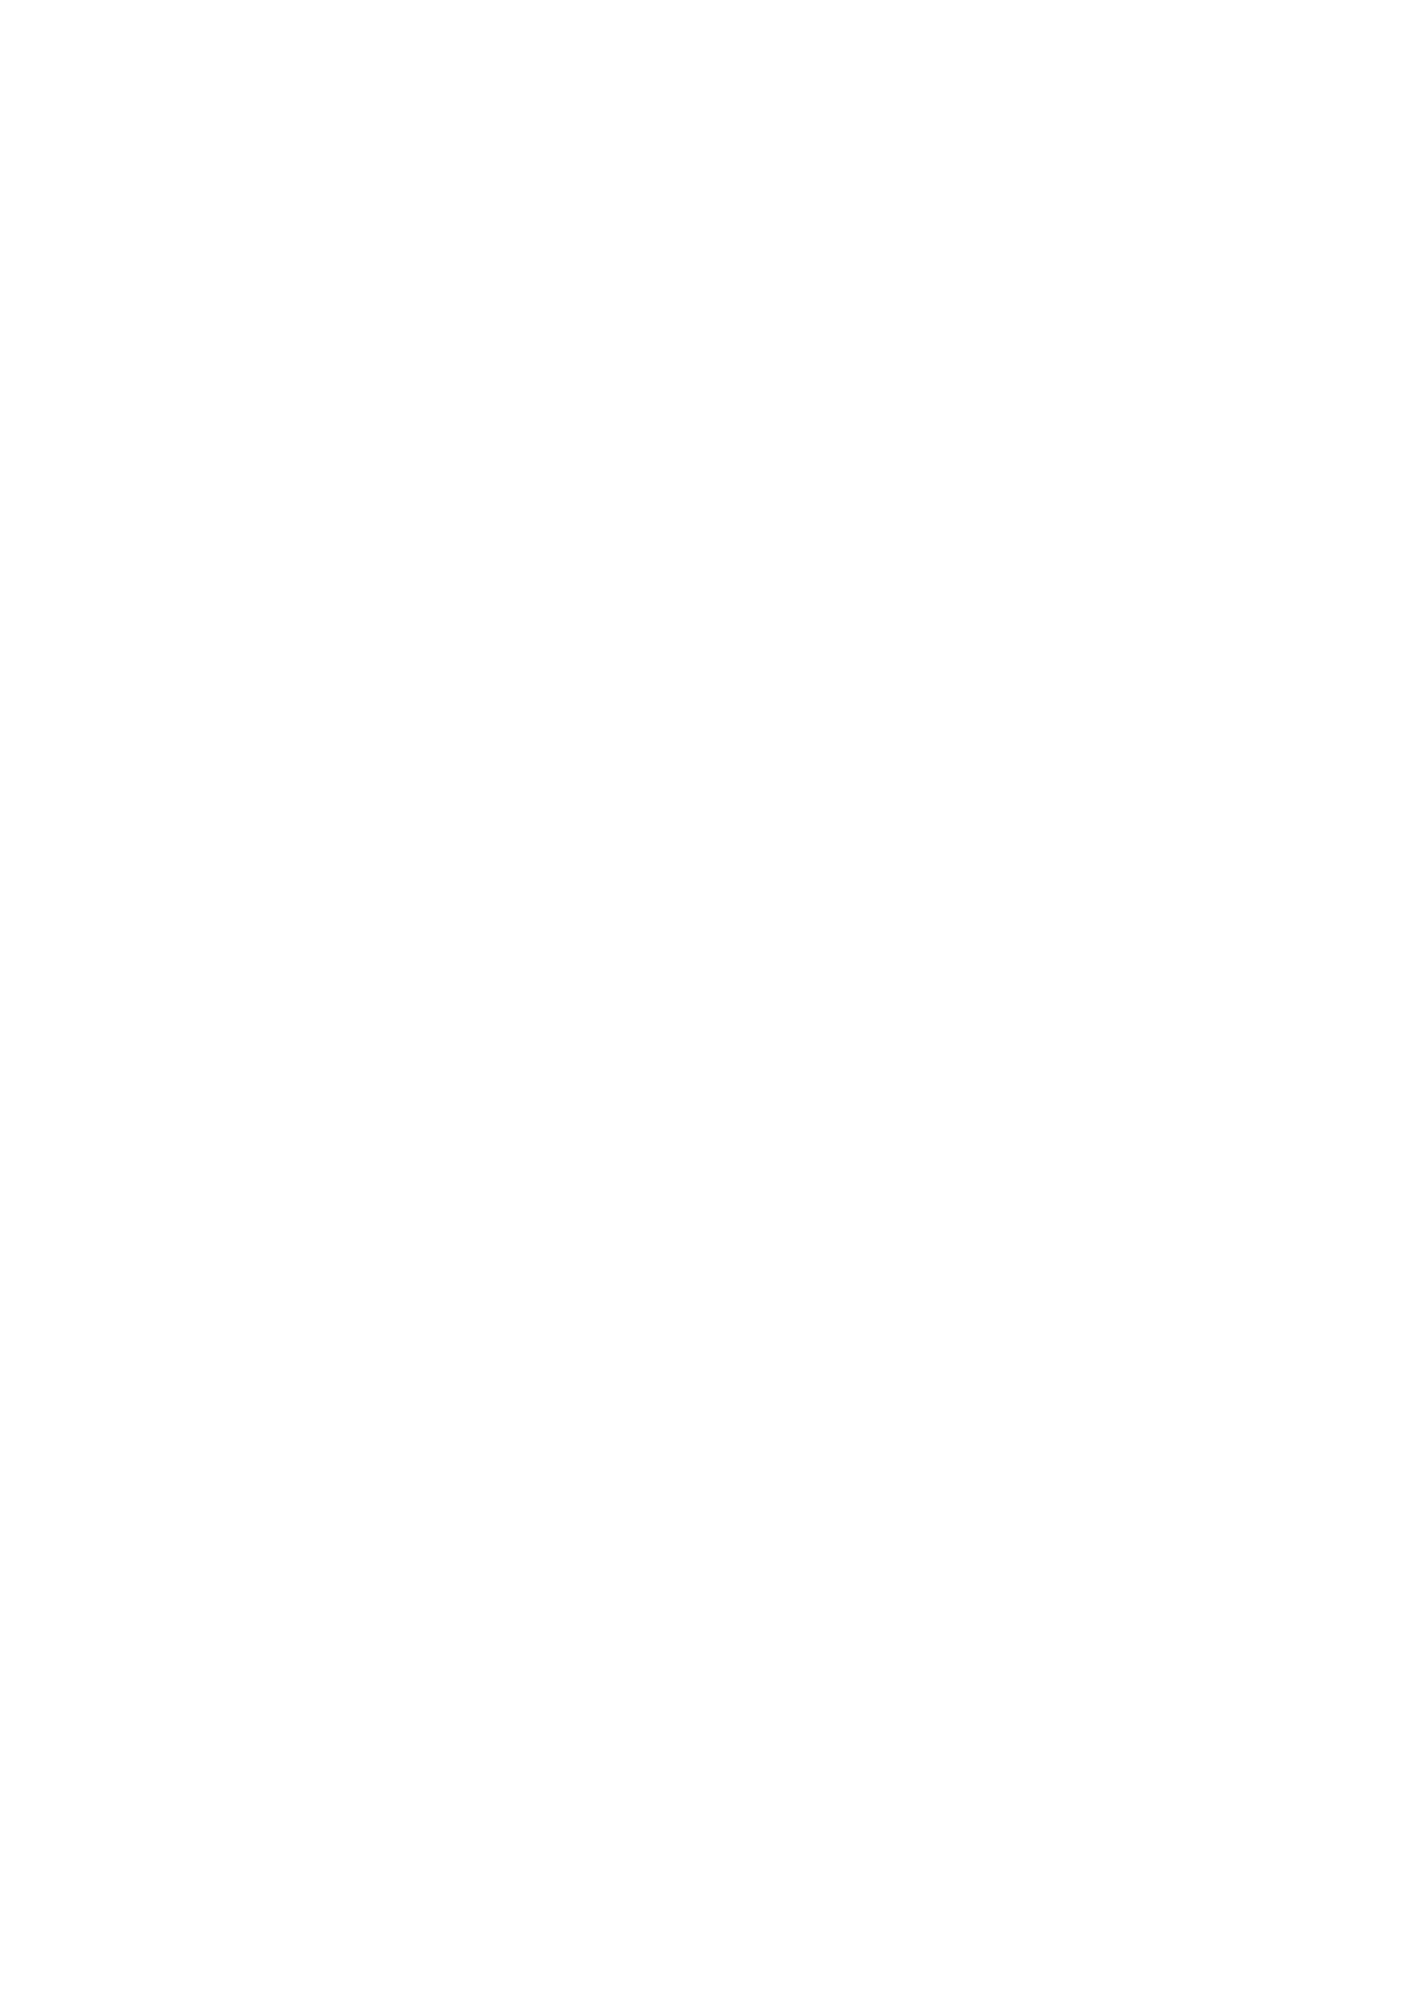 Yasei no Chijo ga Arawareta! 3   A Wild Nymphomaniac Appeared! 3 1